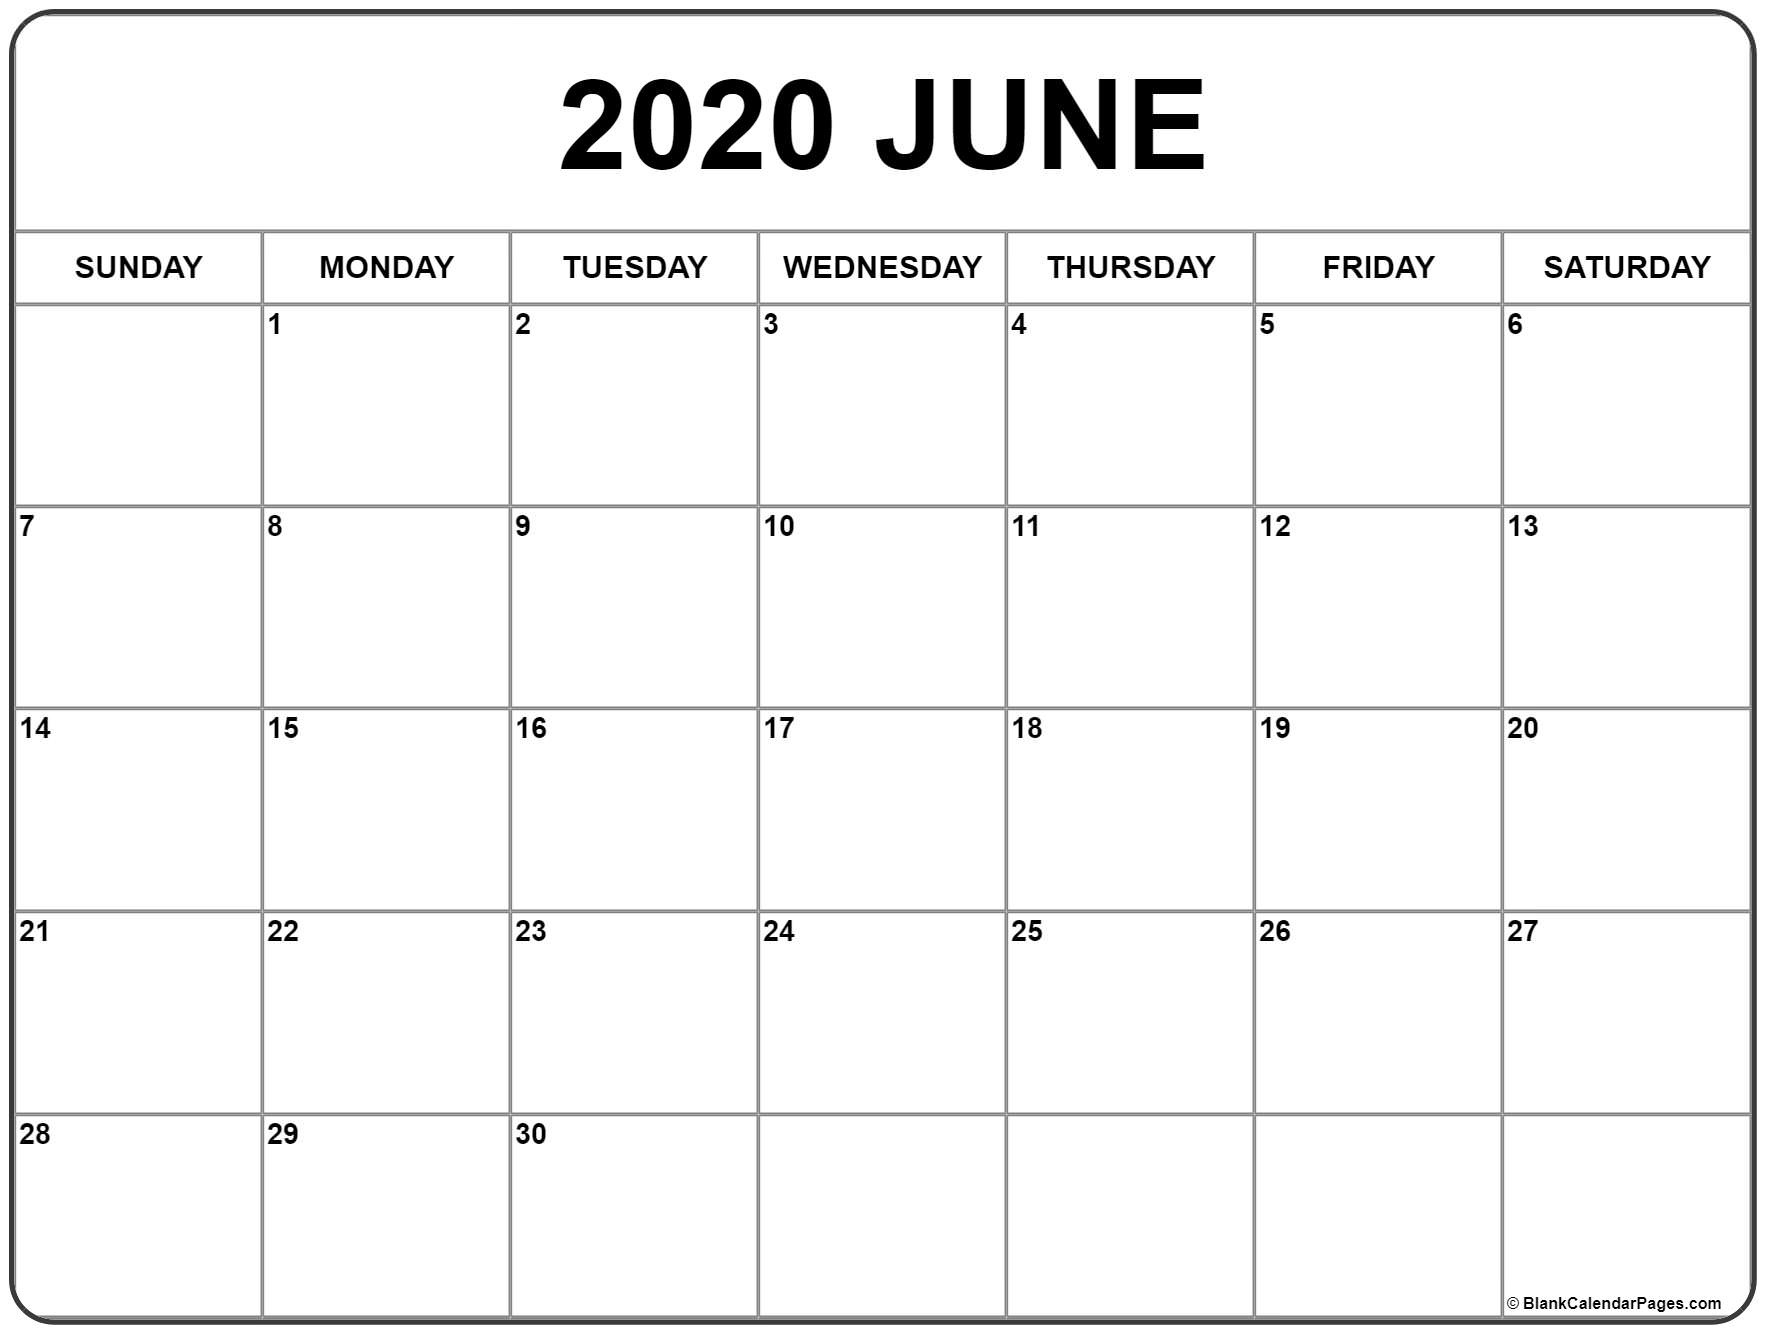 June 2020 Calendar | Free Printable Monthly Calendars_A Blank Calendar For June 2020